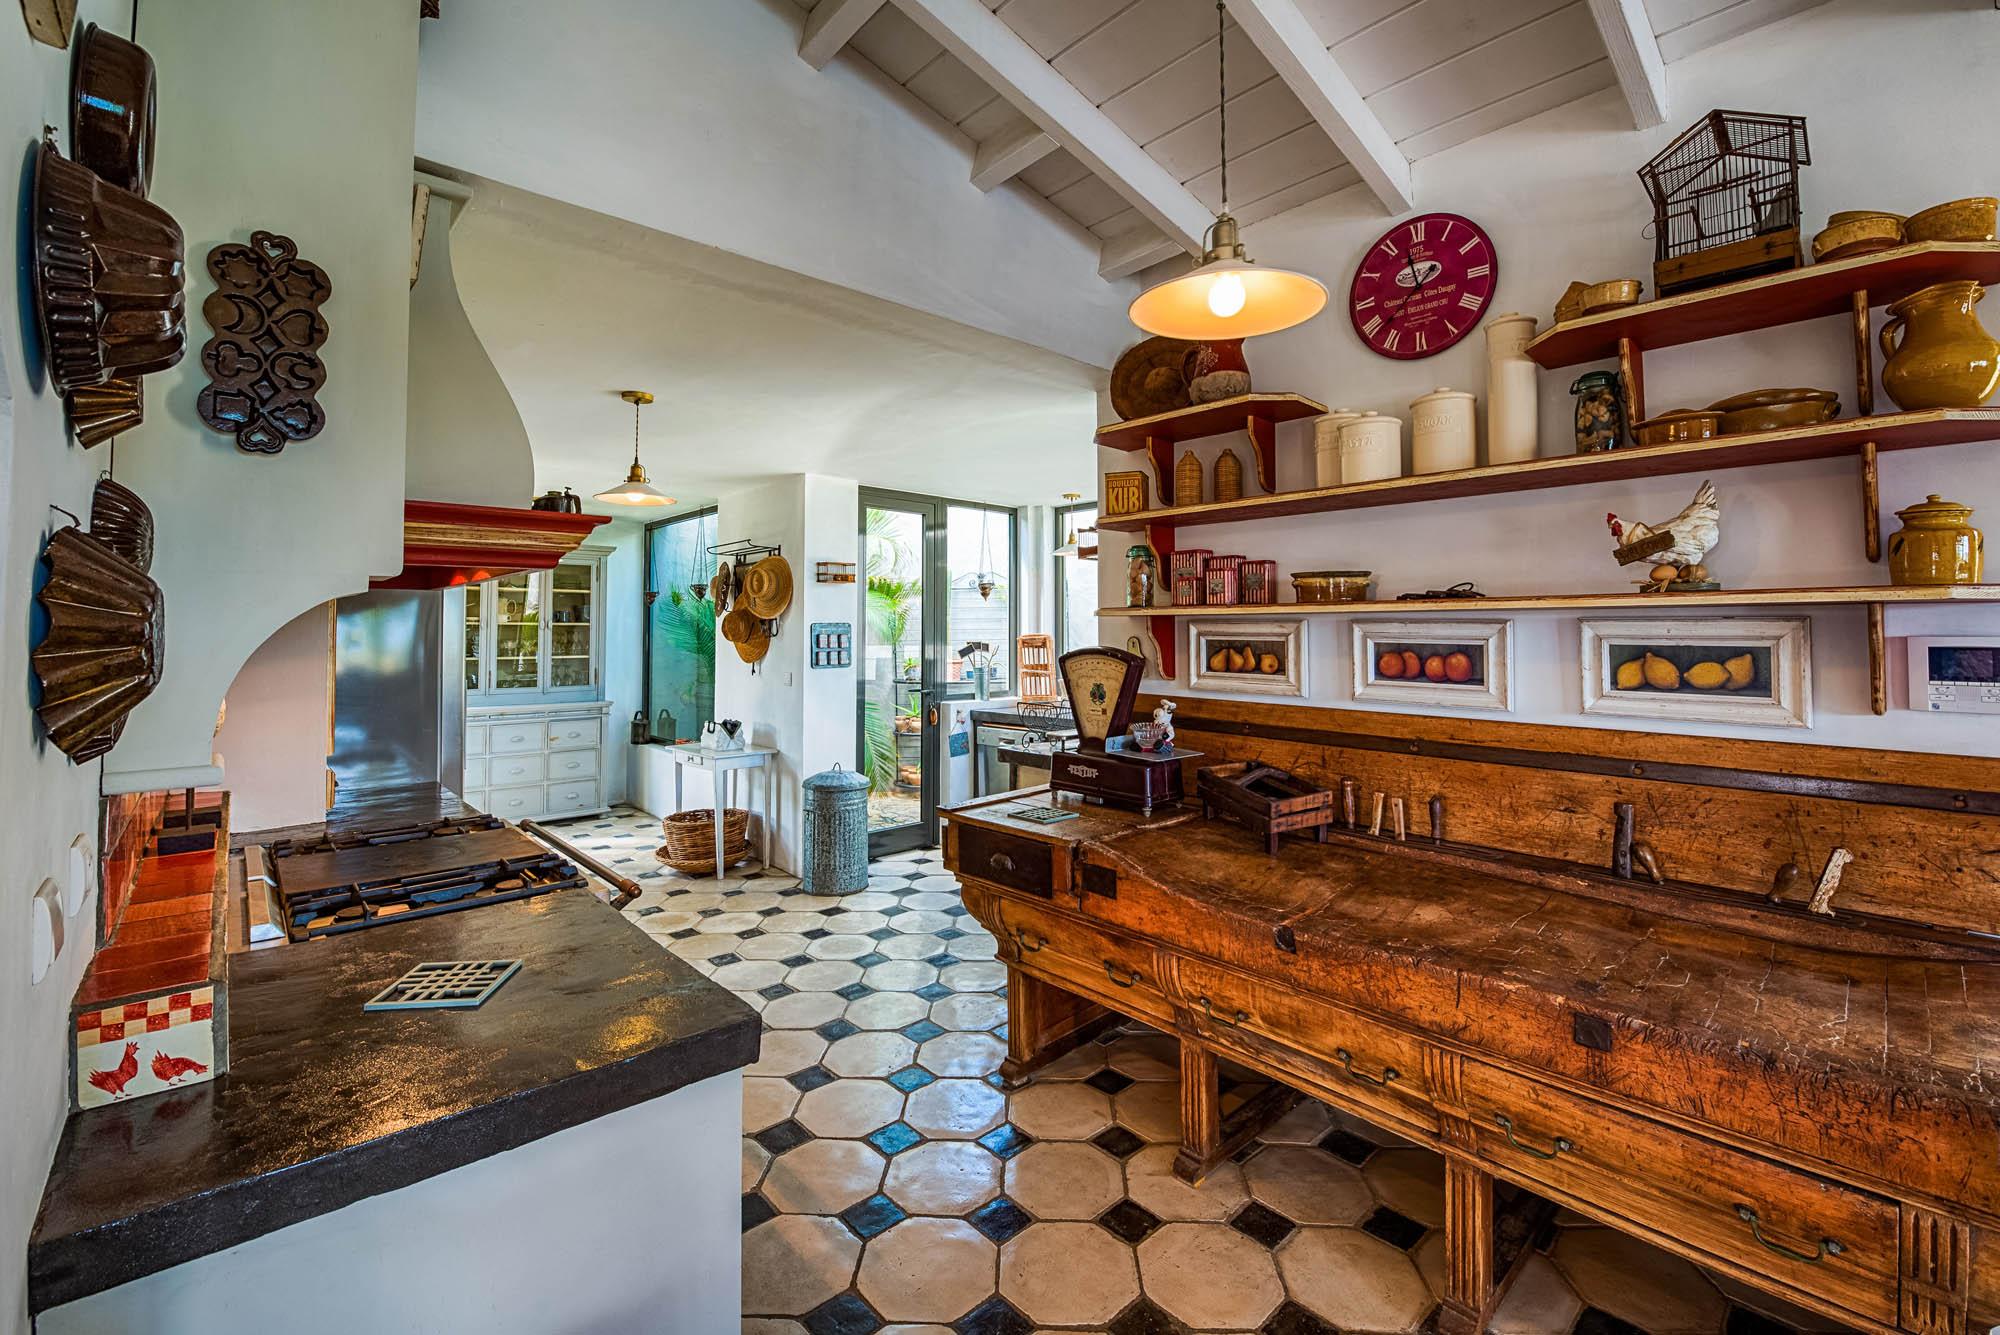 Le Mas des Sables villa rental, Baie aux Cayes, Terres Basses, Saint Martin, Caribbean with the tastefully designed kitchen.